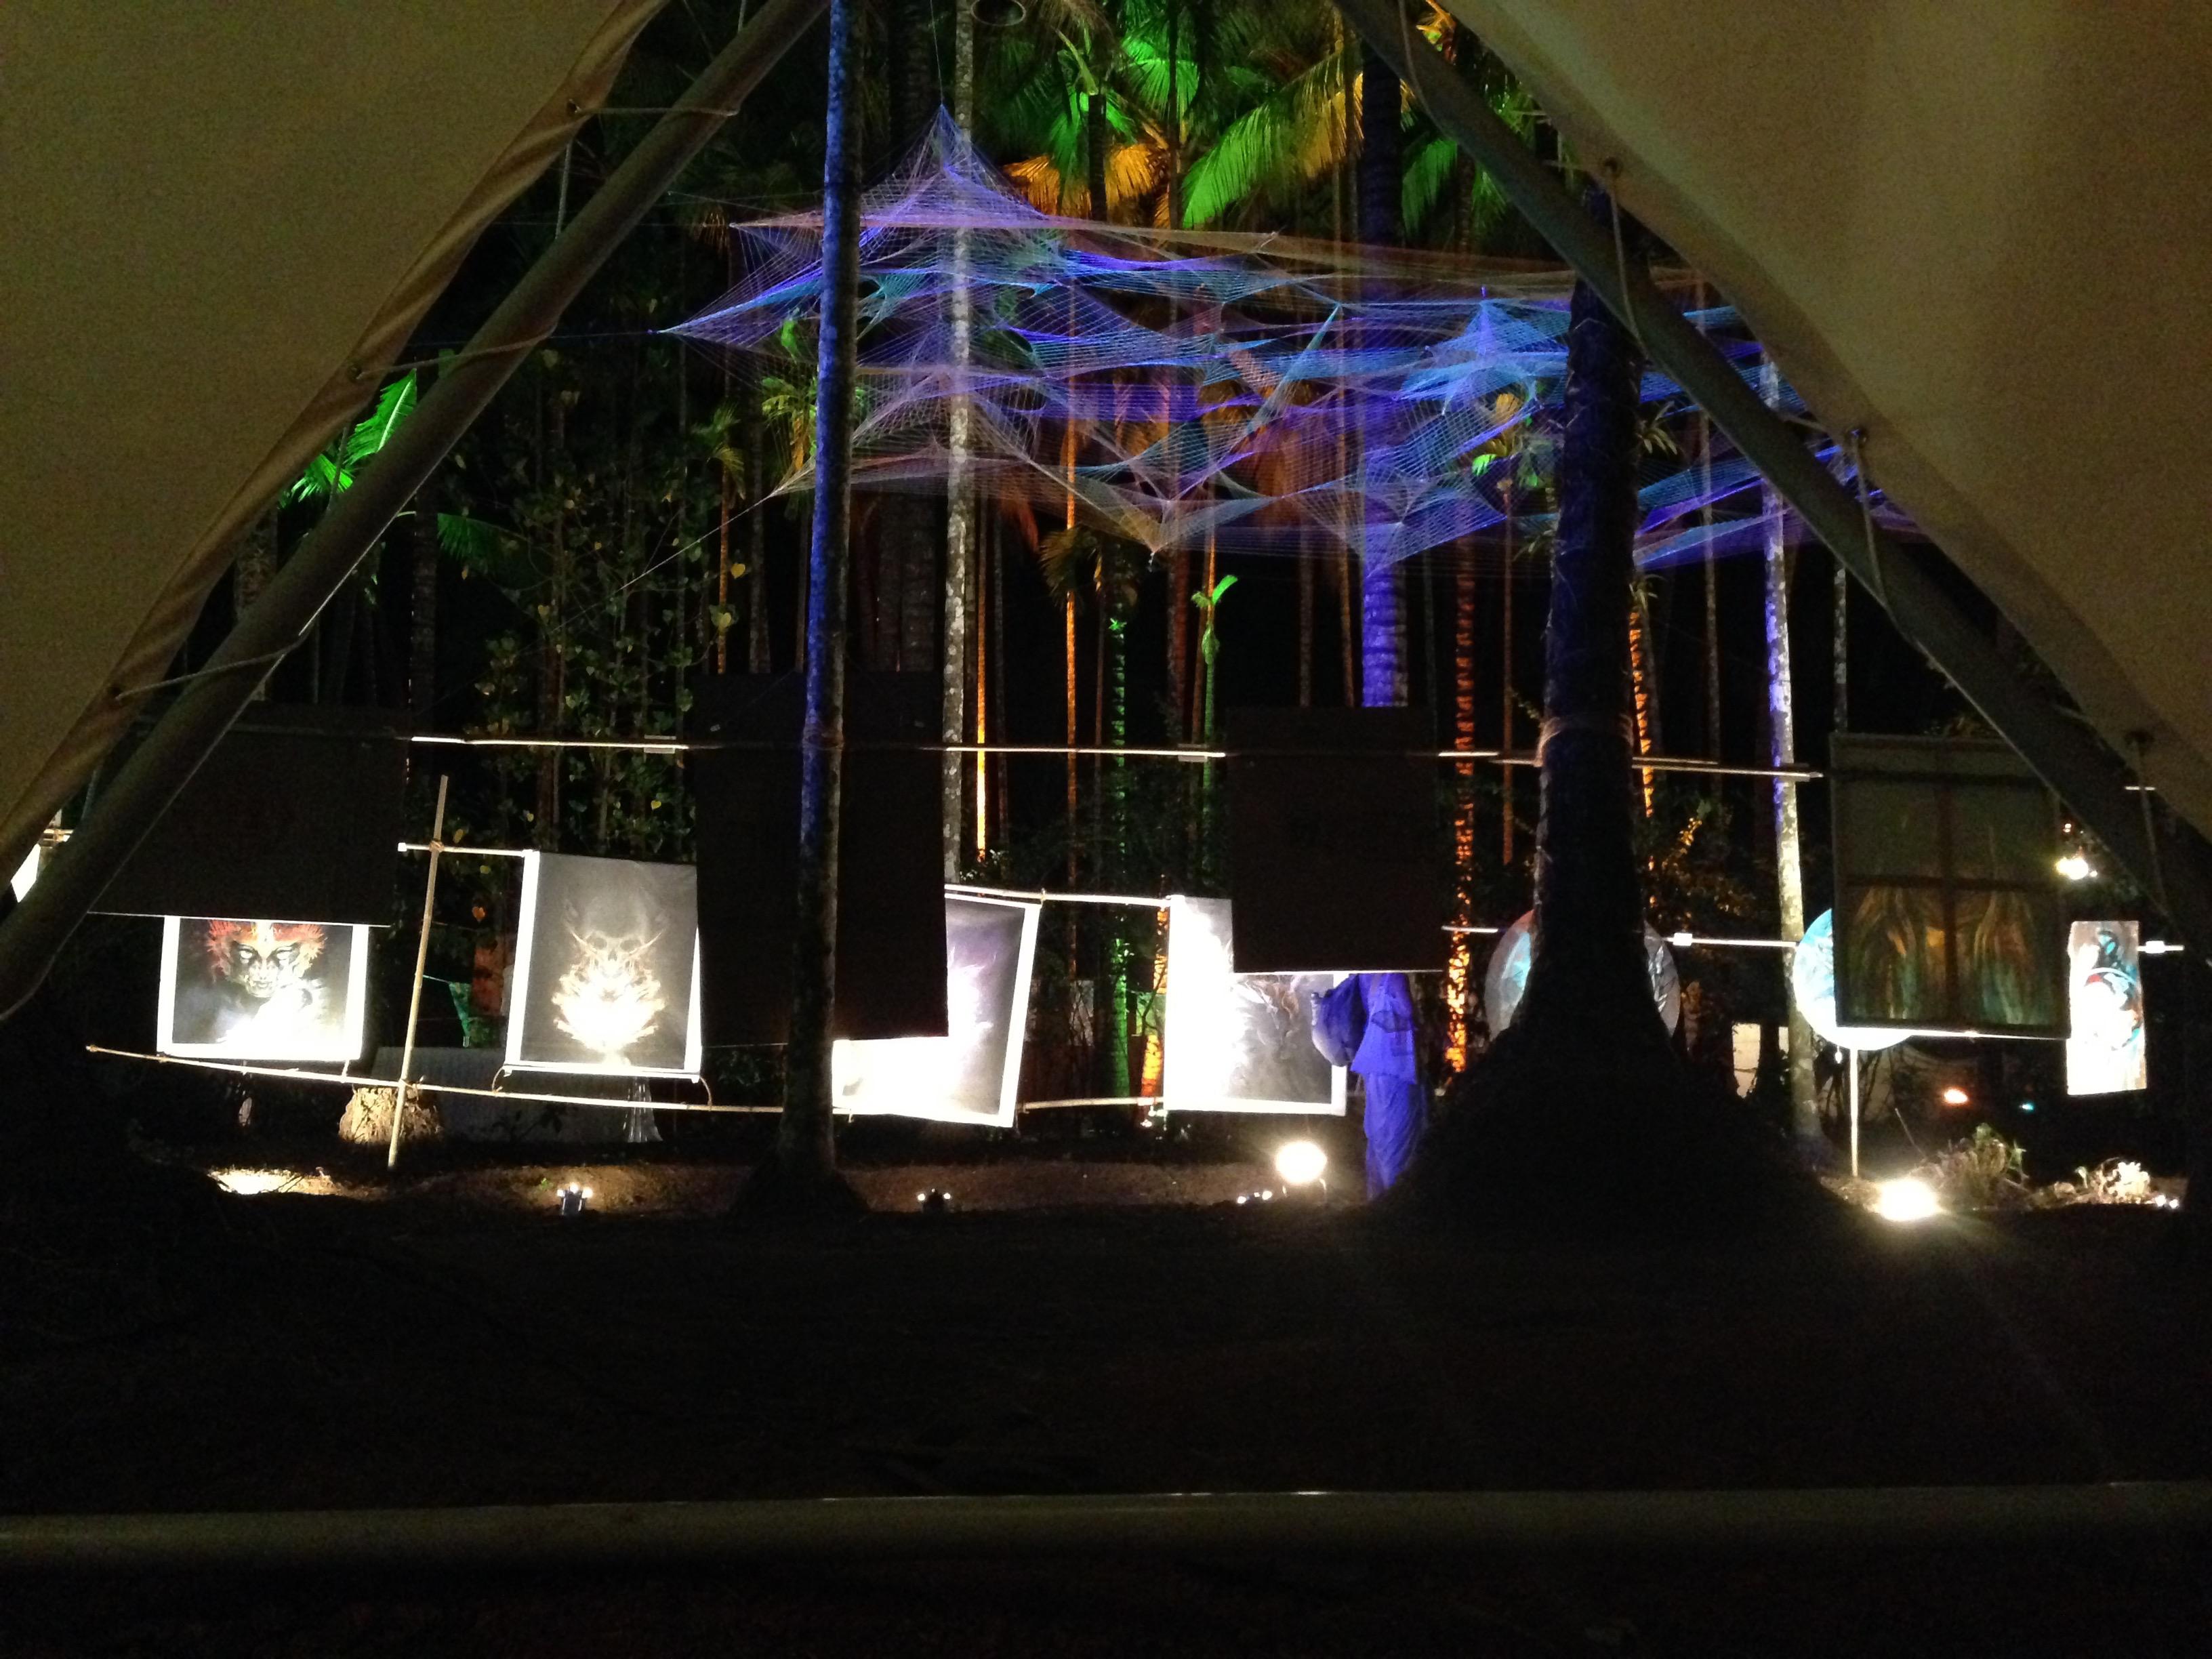 Vasundhara Gallery from Temple